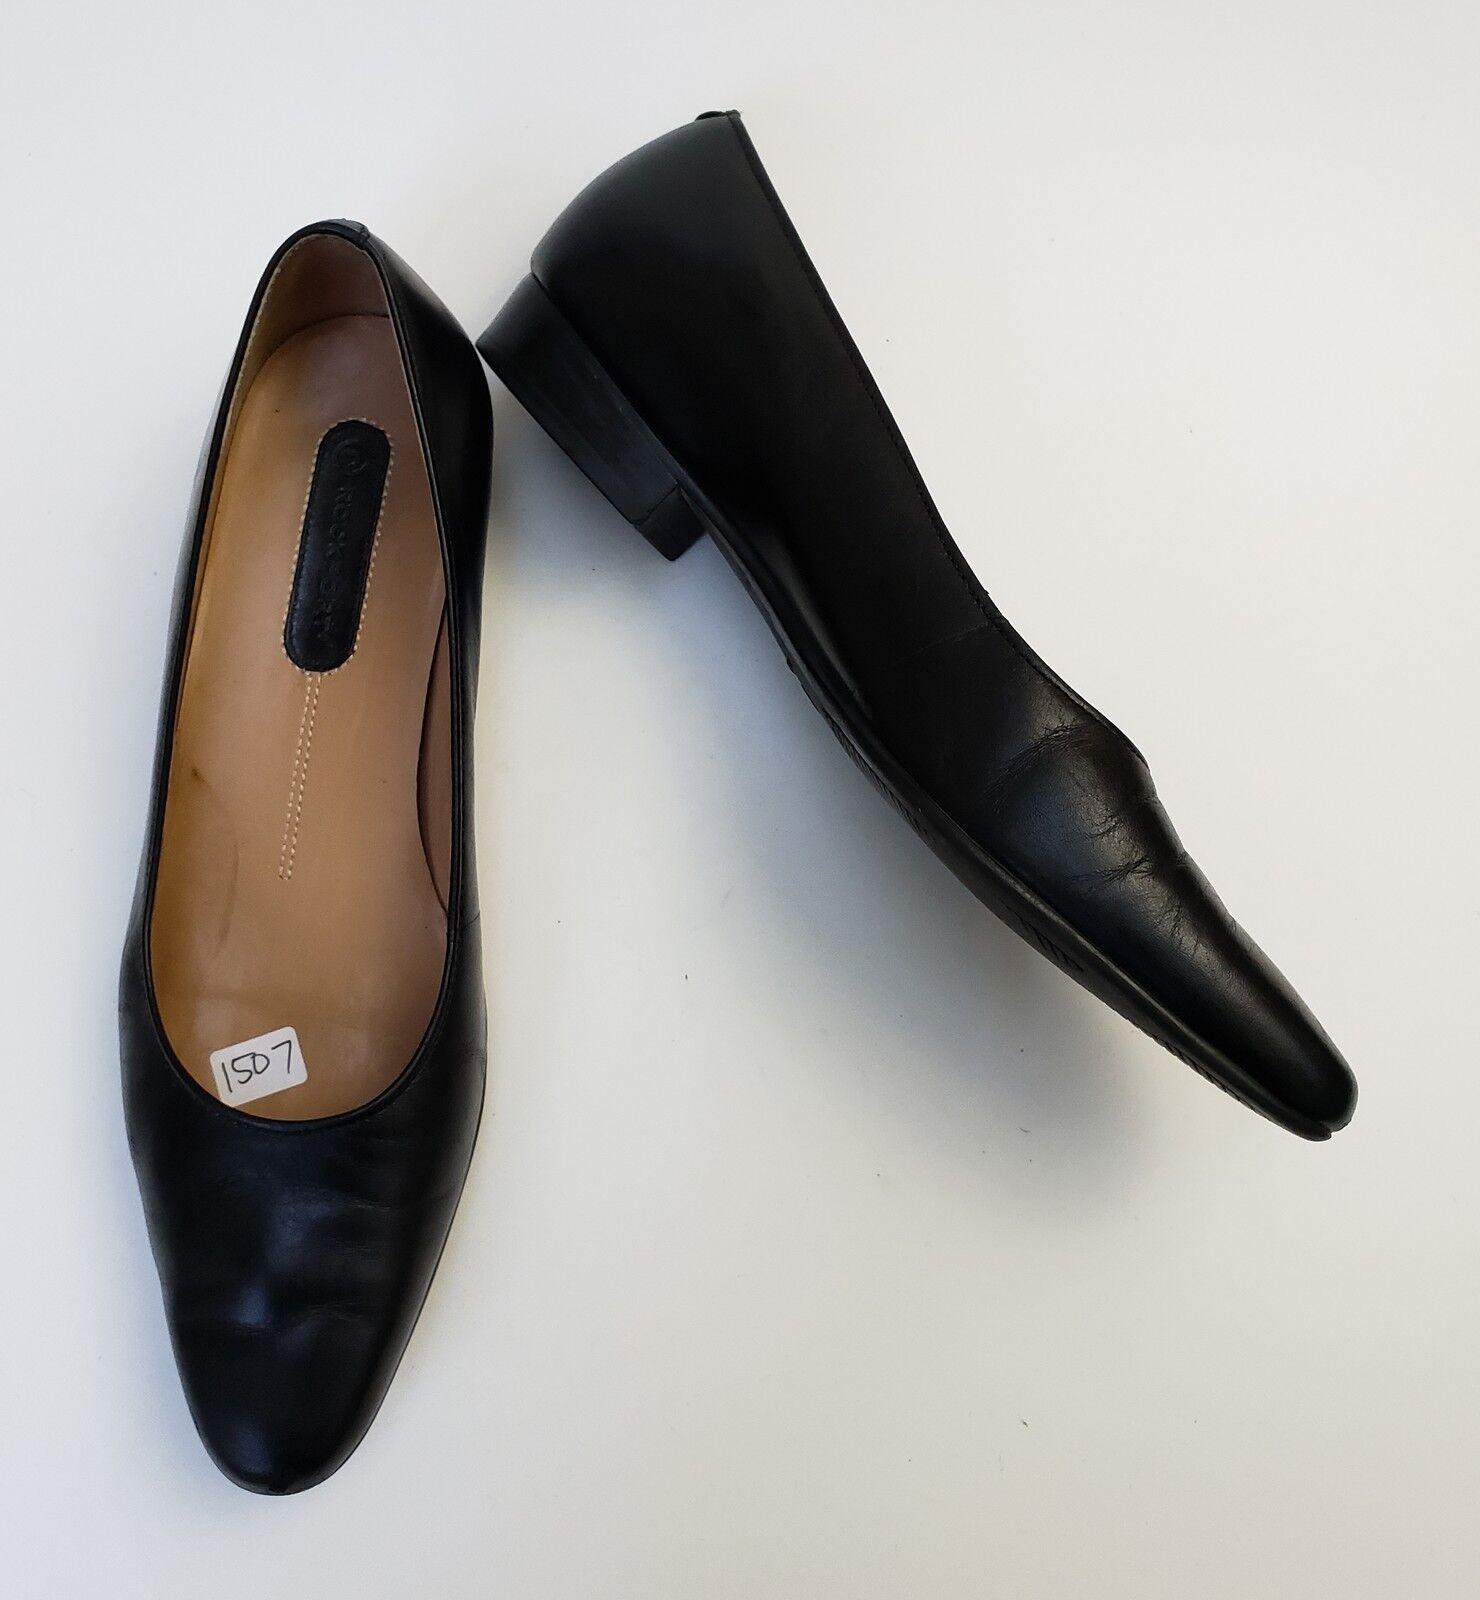 Rockport shoes Flats Black Slip On Womens Size 6.5 M